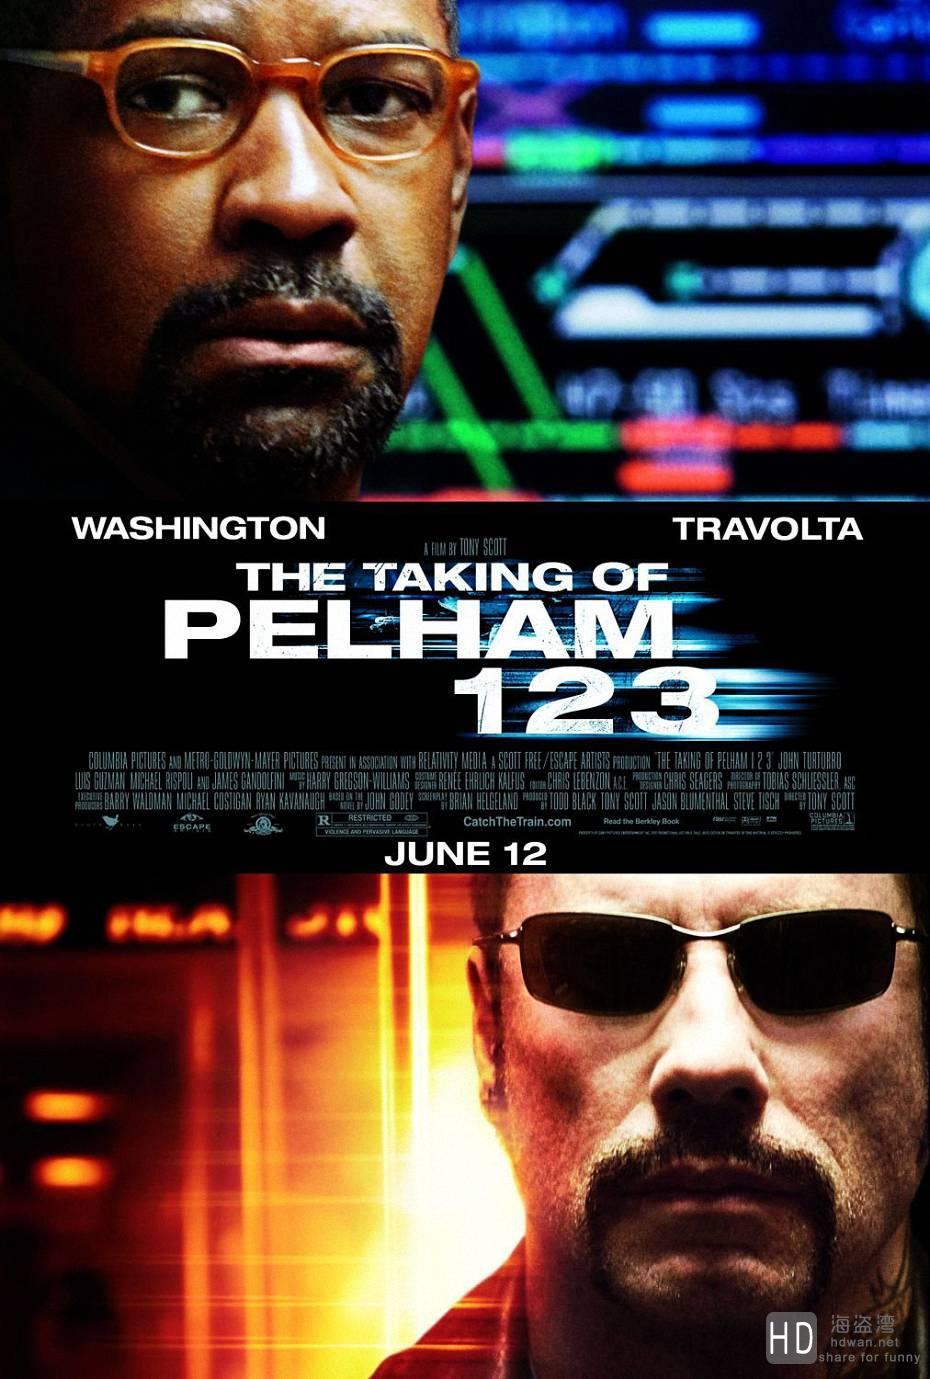 [2009][美国][地铁惊魂 The Taking of Pelham ][1080P/高清电影下载]